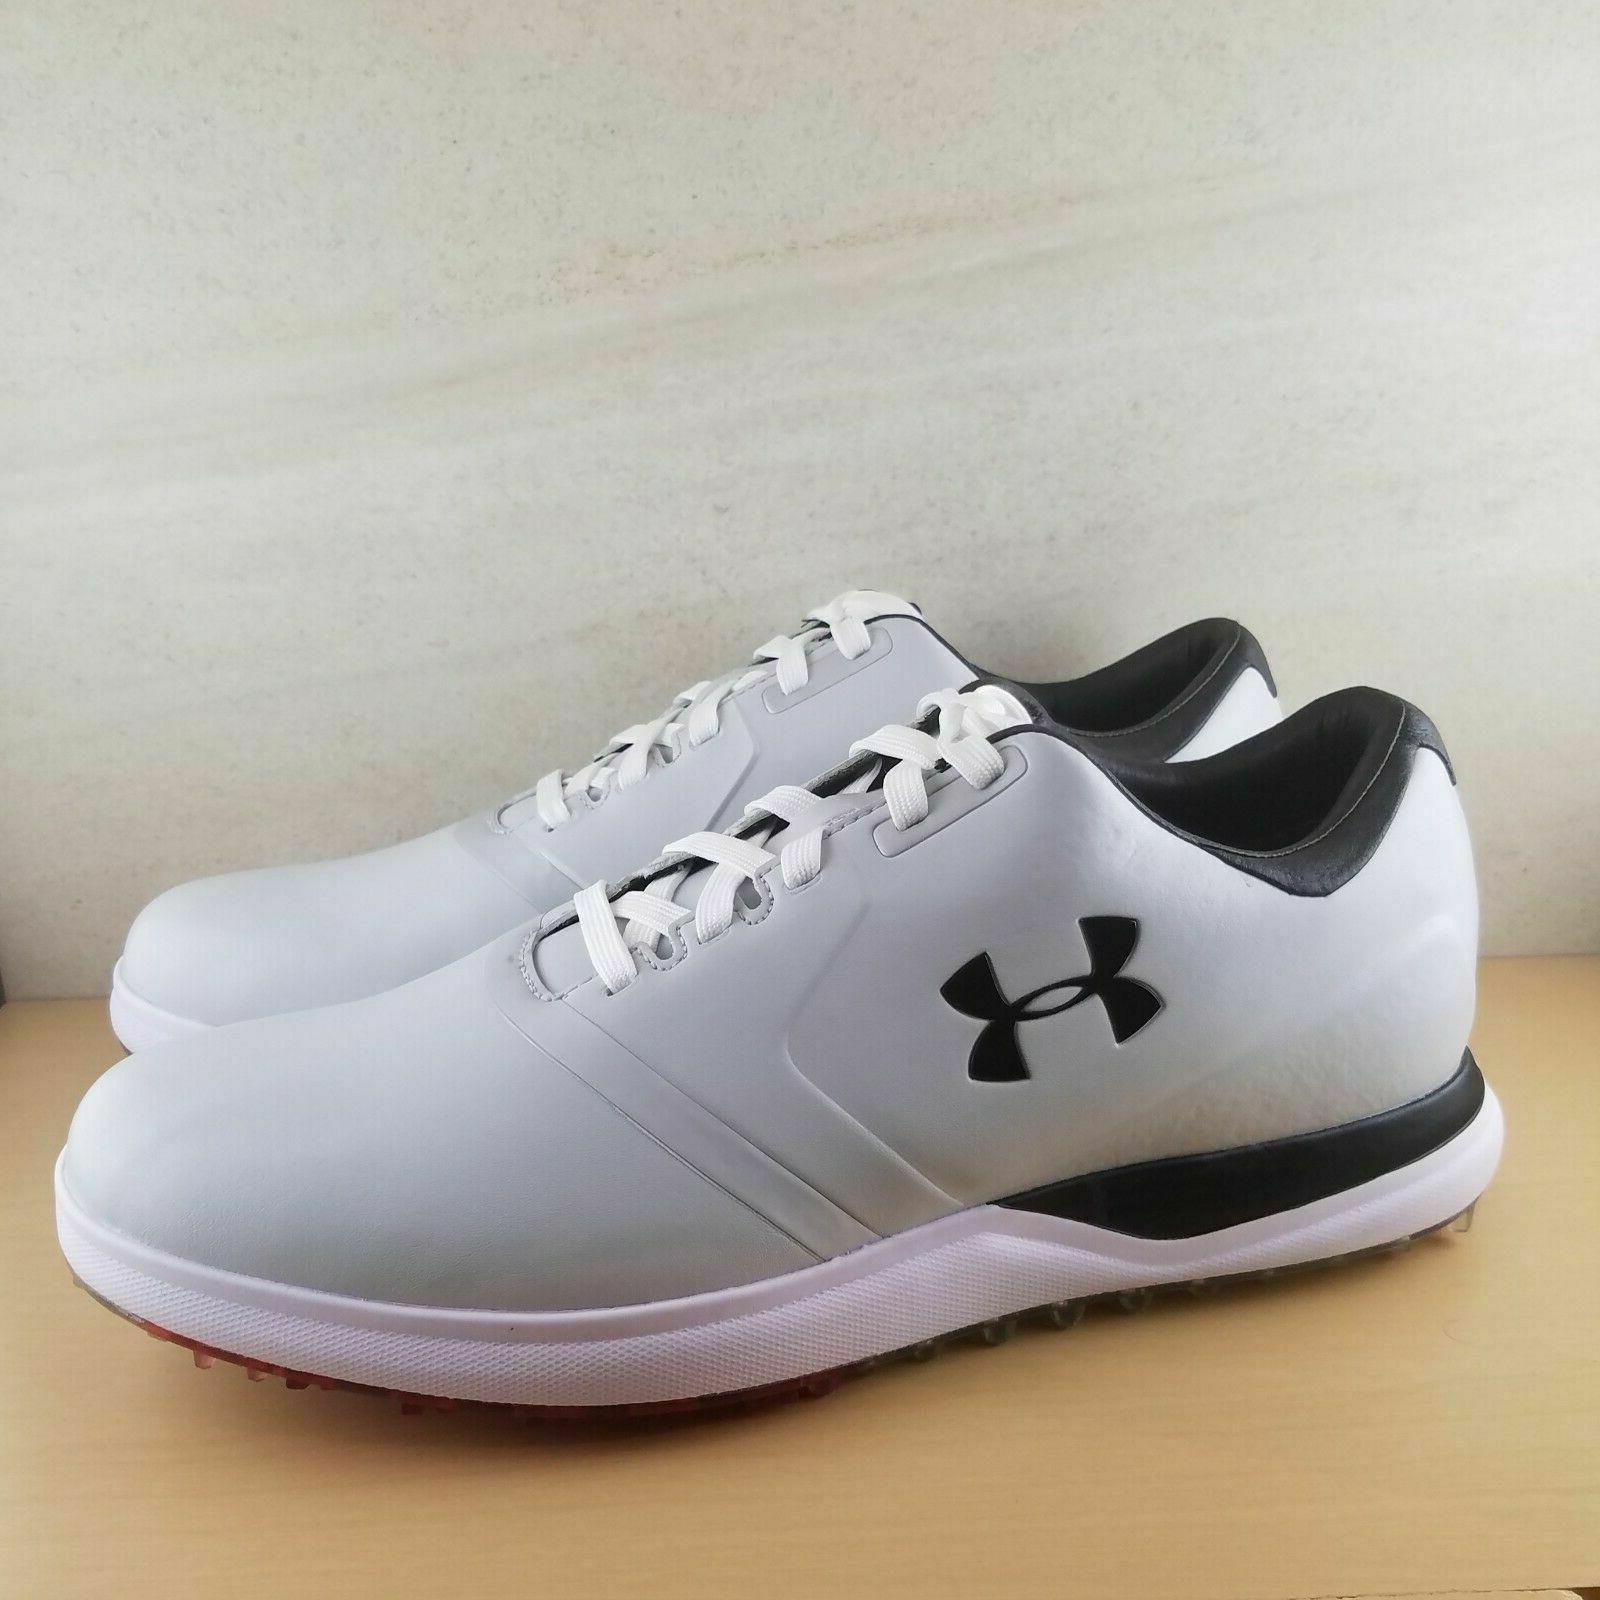 ua performance sl mens golf shoes grey